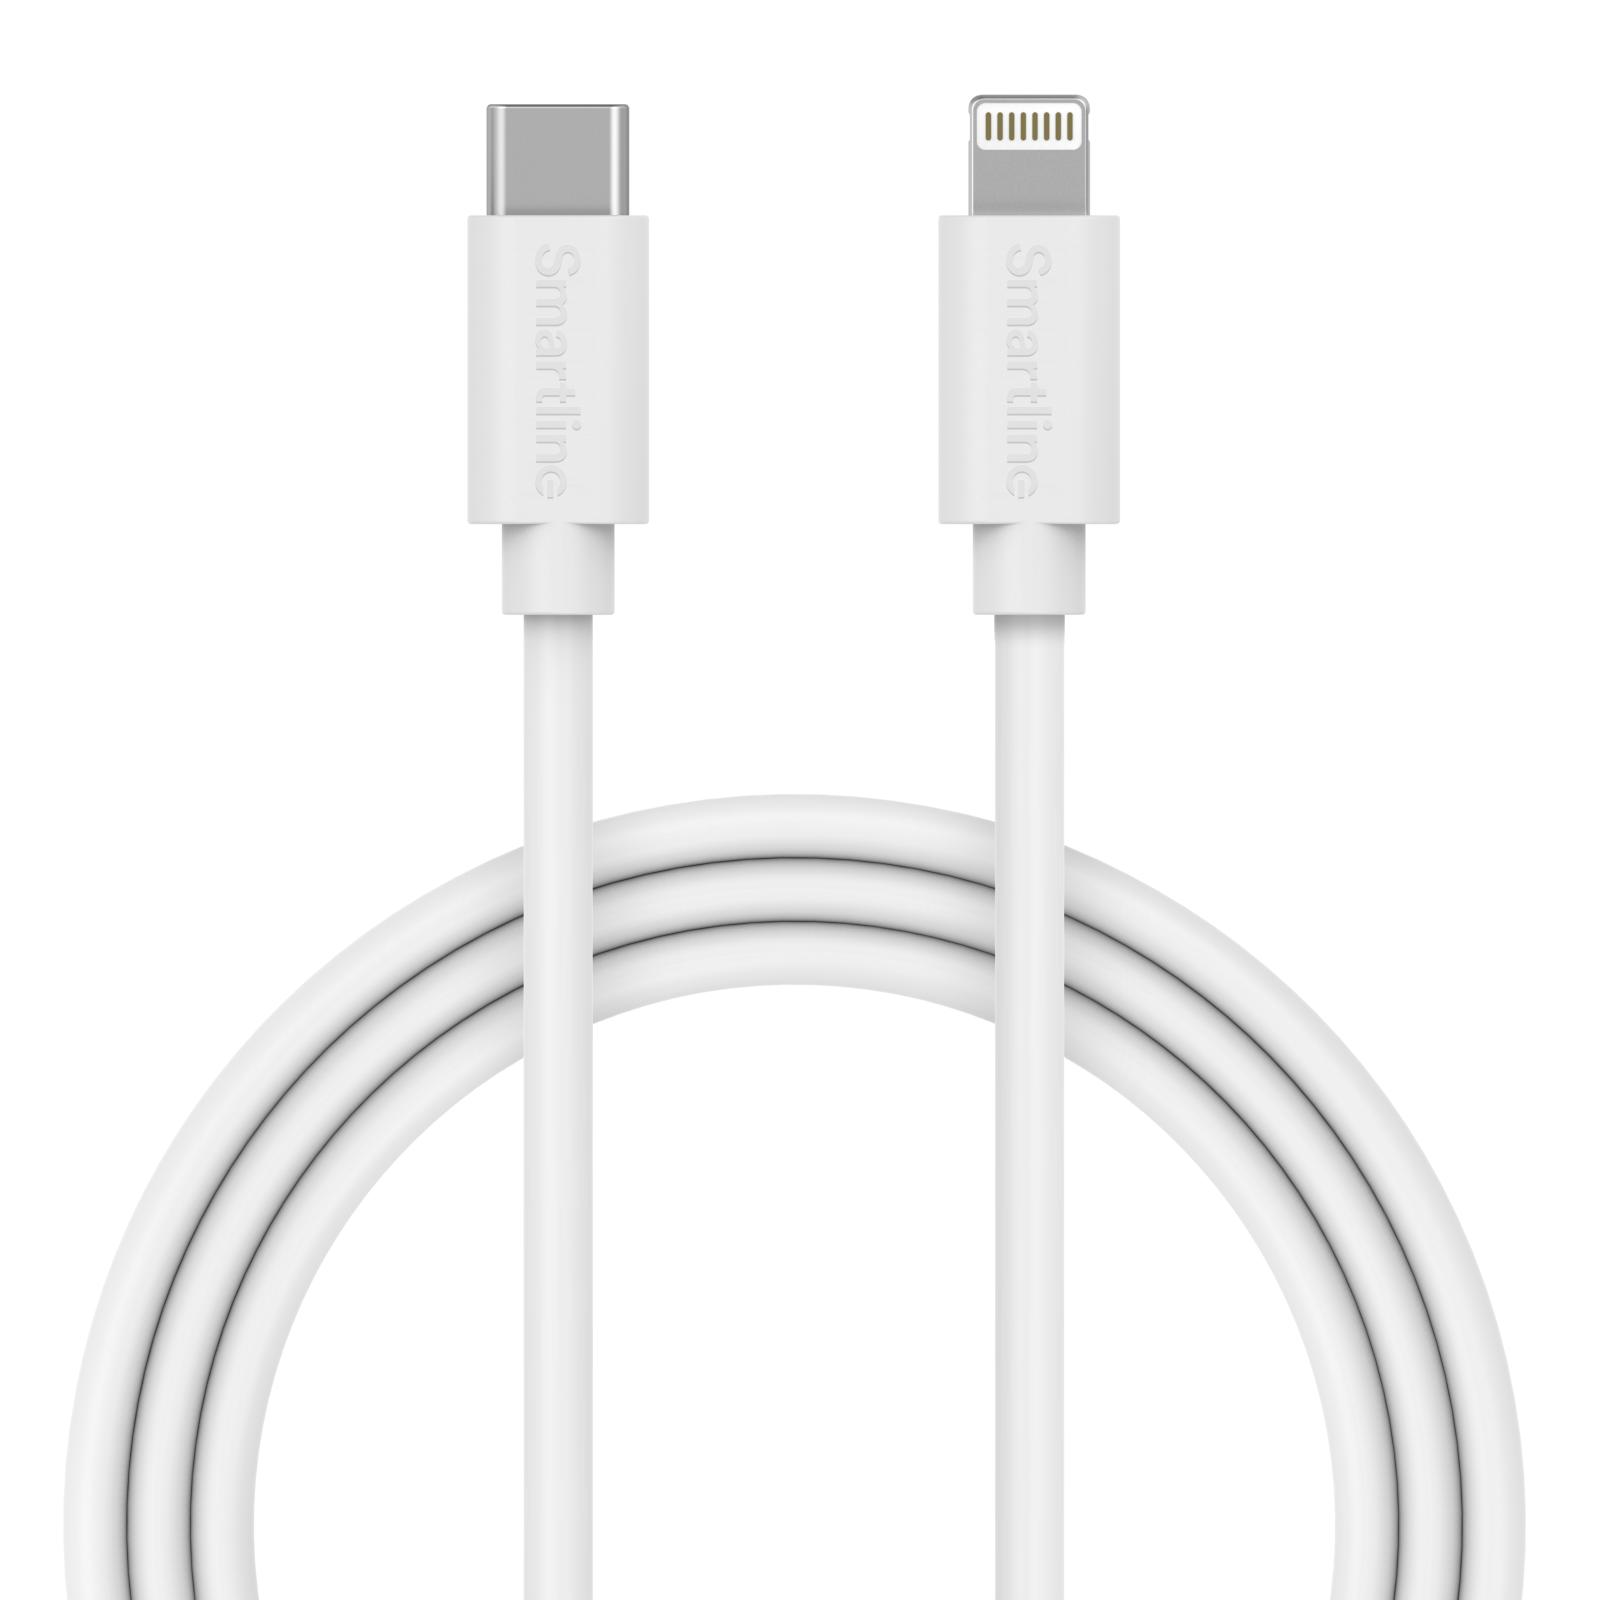 USB Cable USB-C to Lightning 2m White